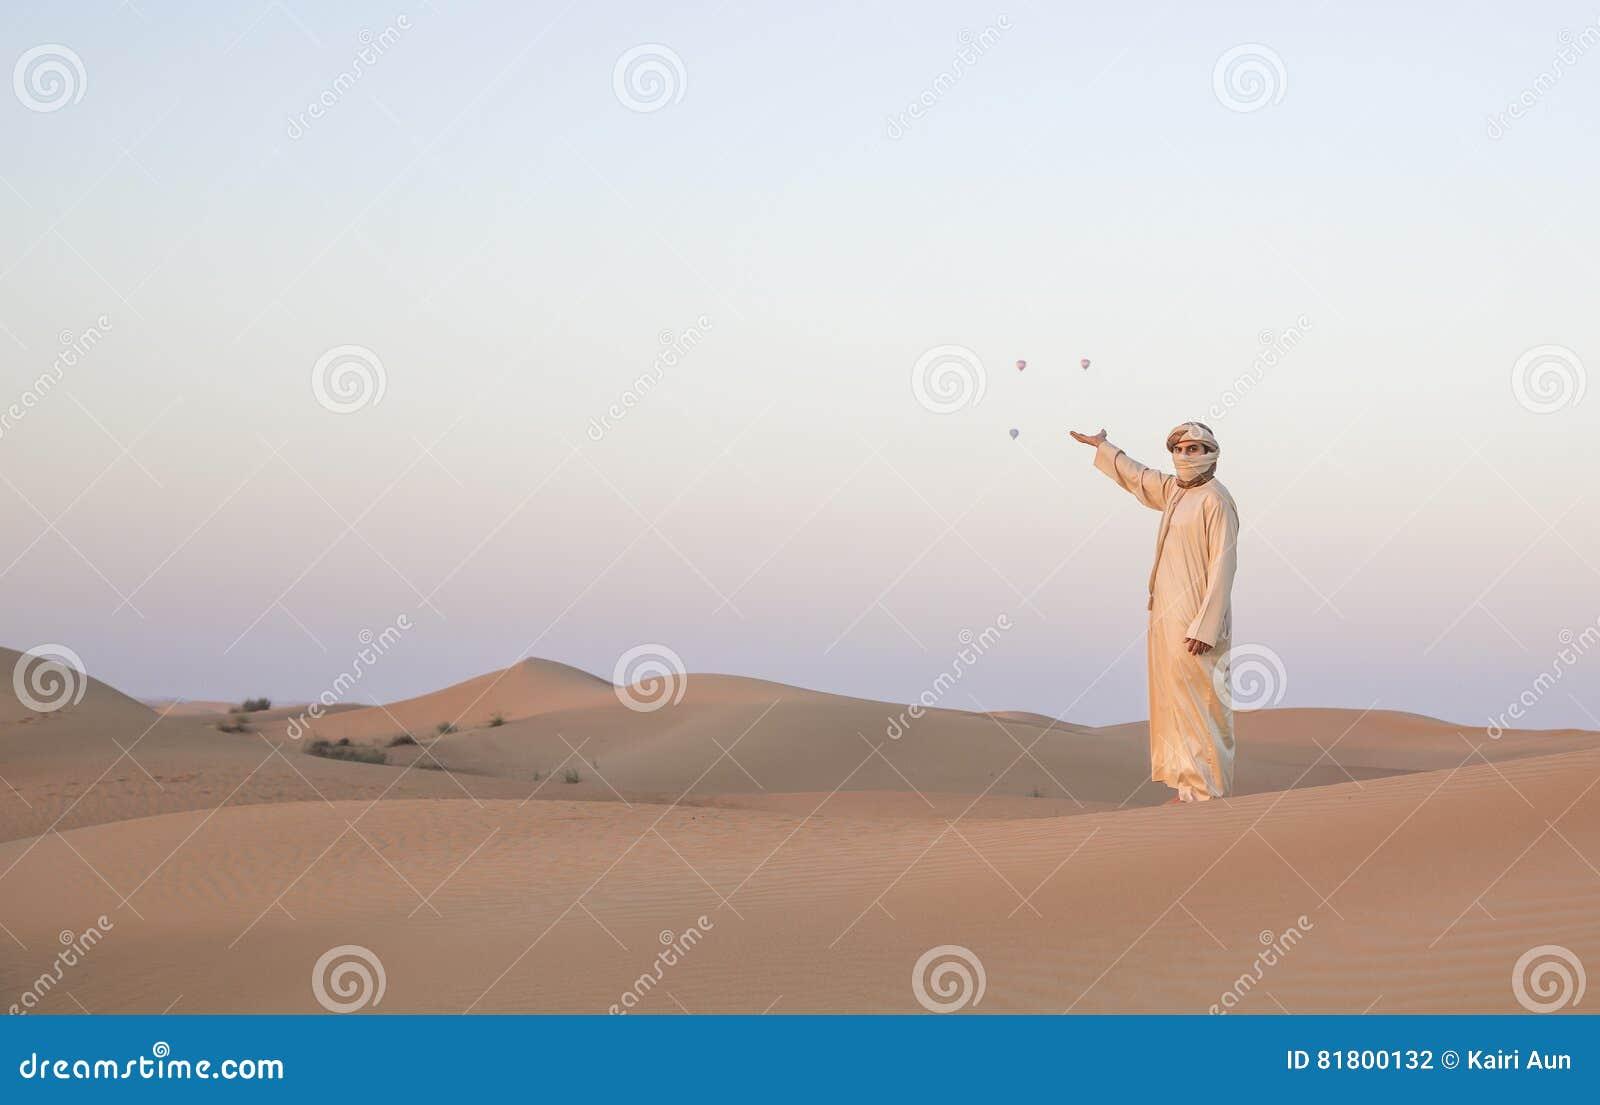 Hombre en equipo tradicional en un desierto cerca de Dubai